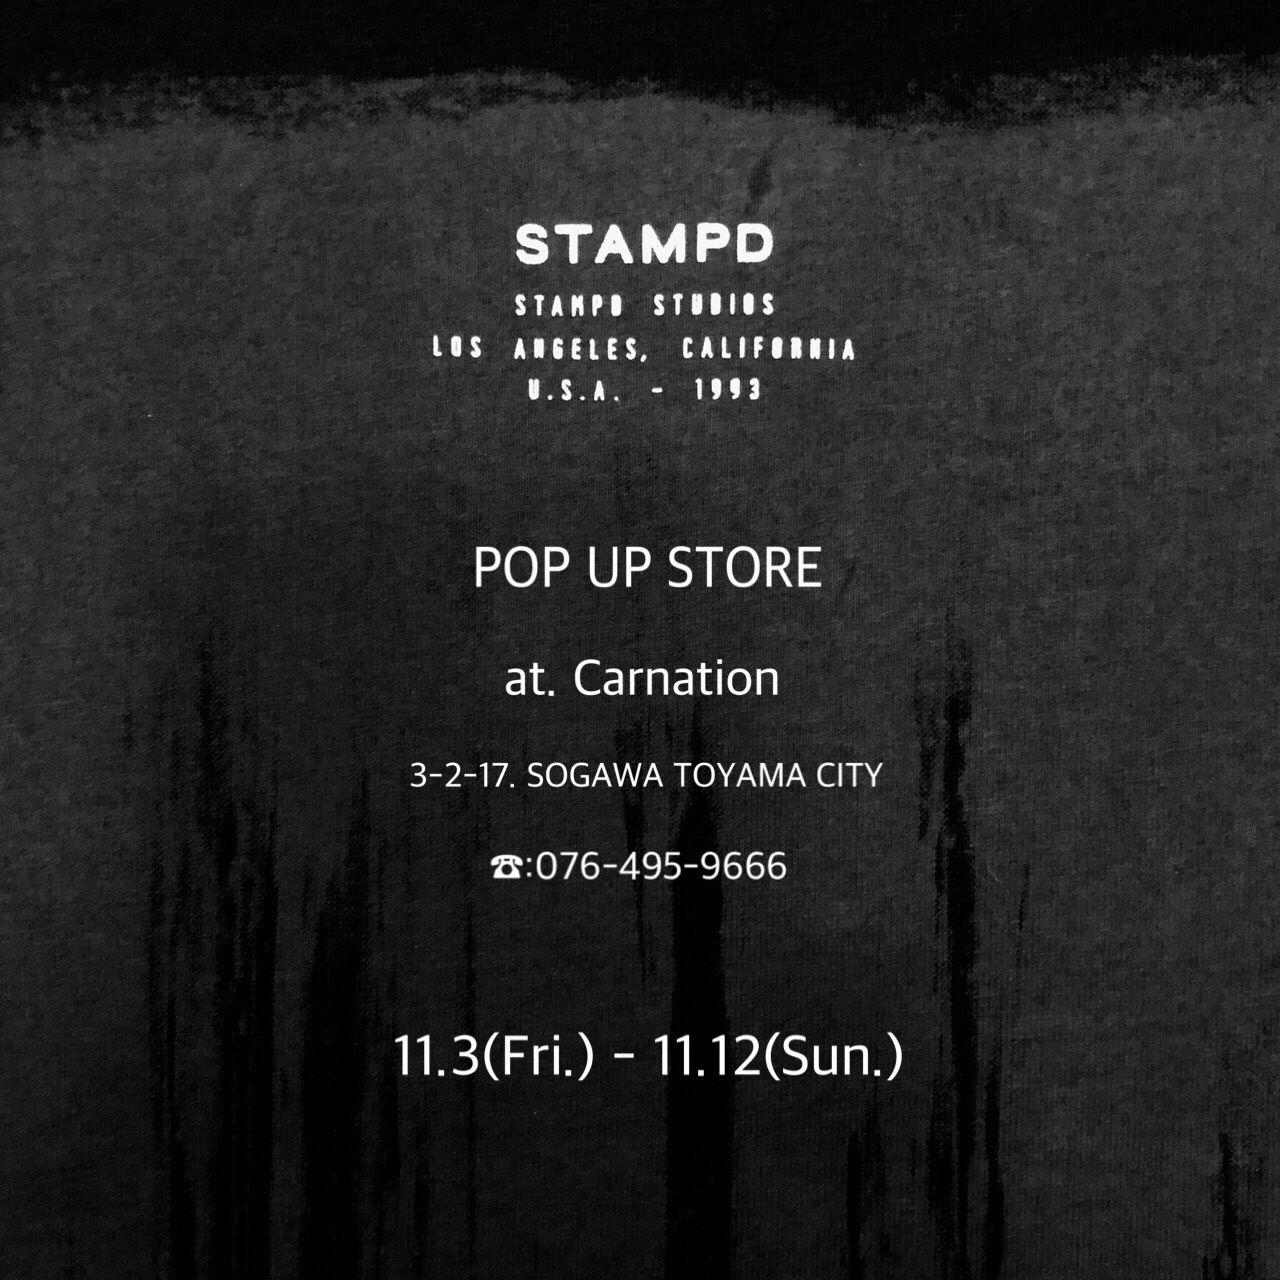 STAPMD POP UP STOREの写真